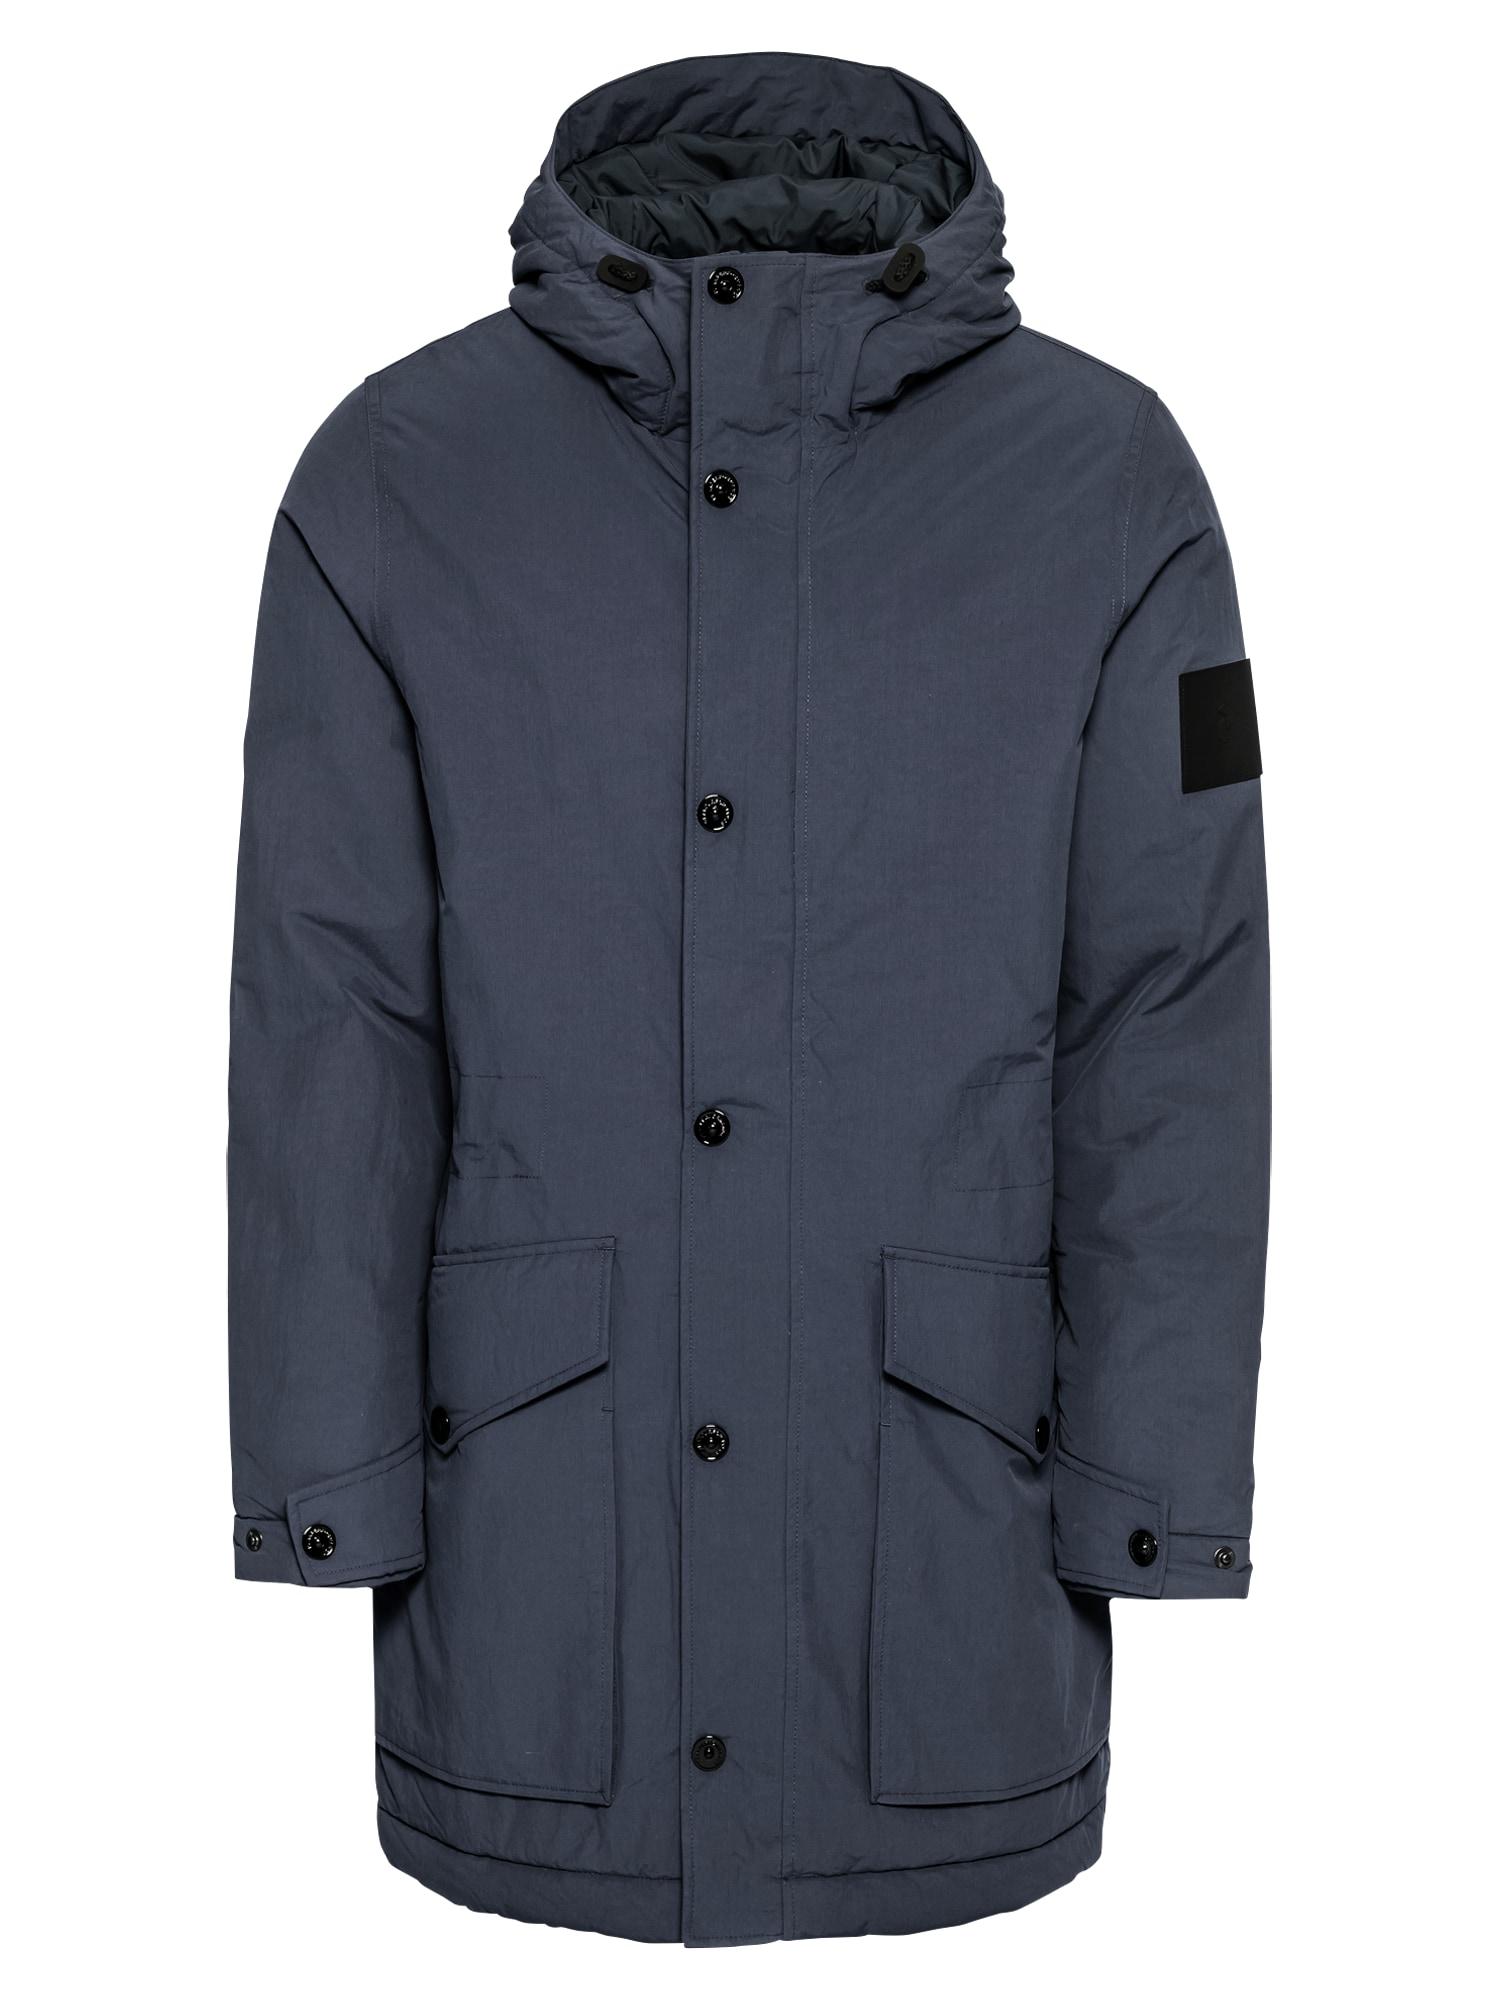 Zimní bunda Typhon tmavě modrá PEAK PERFORMANCE